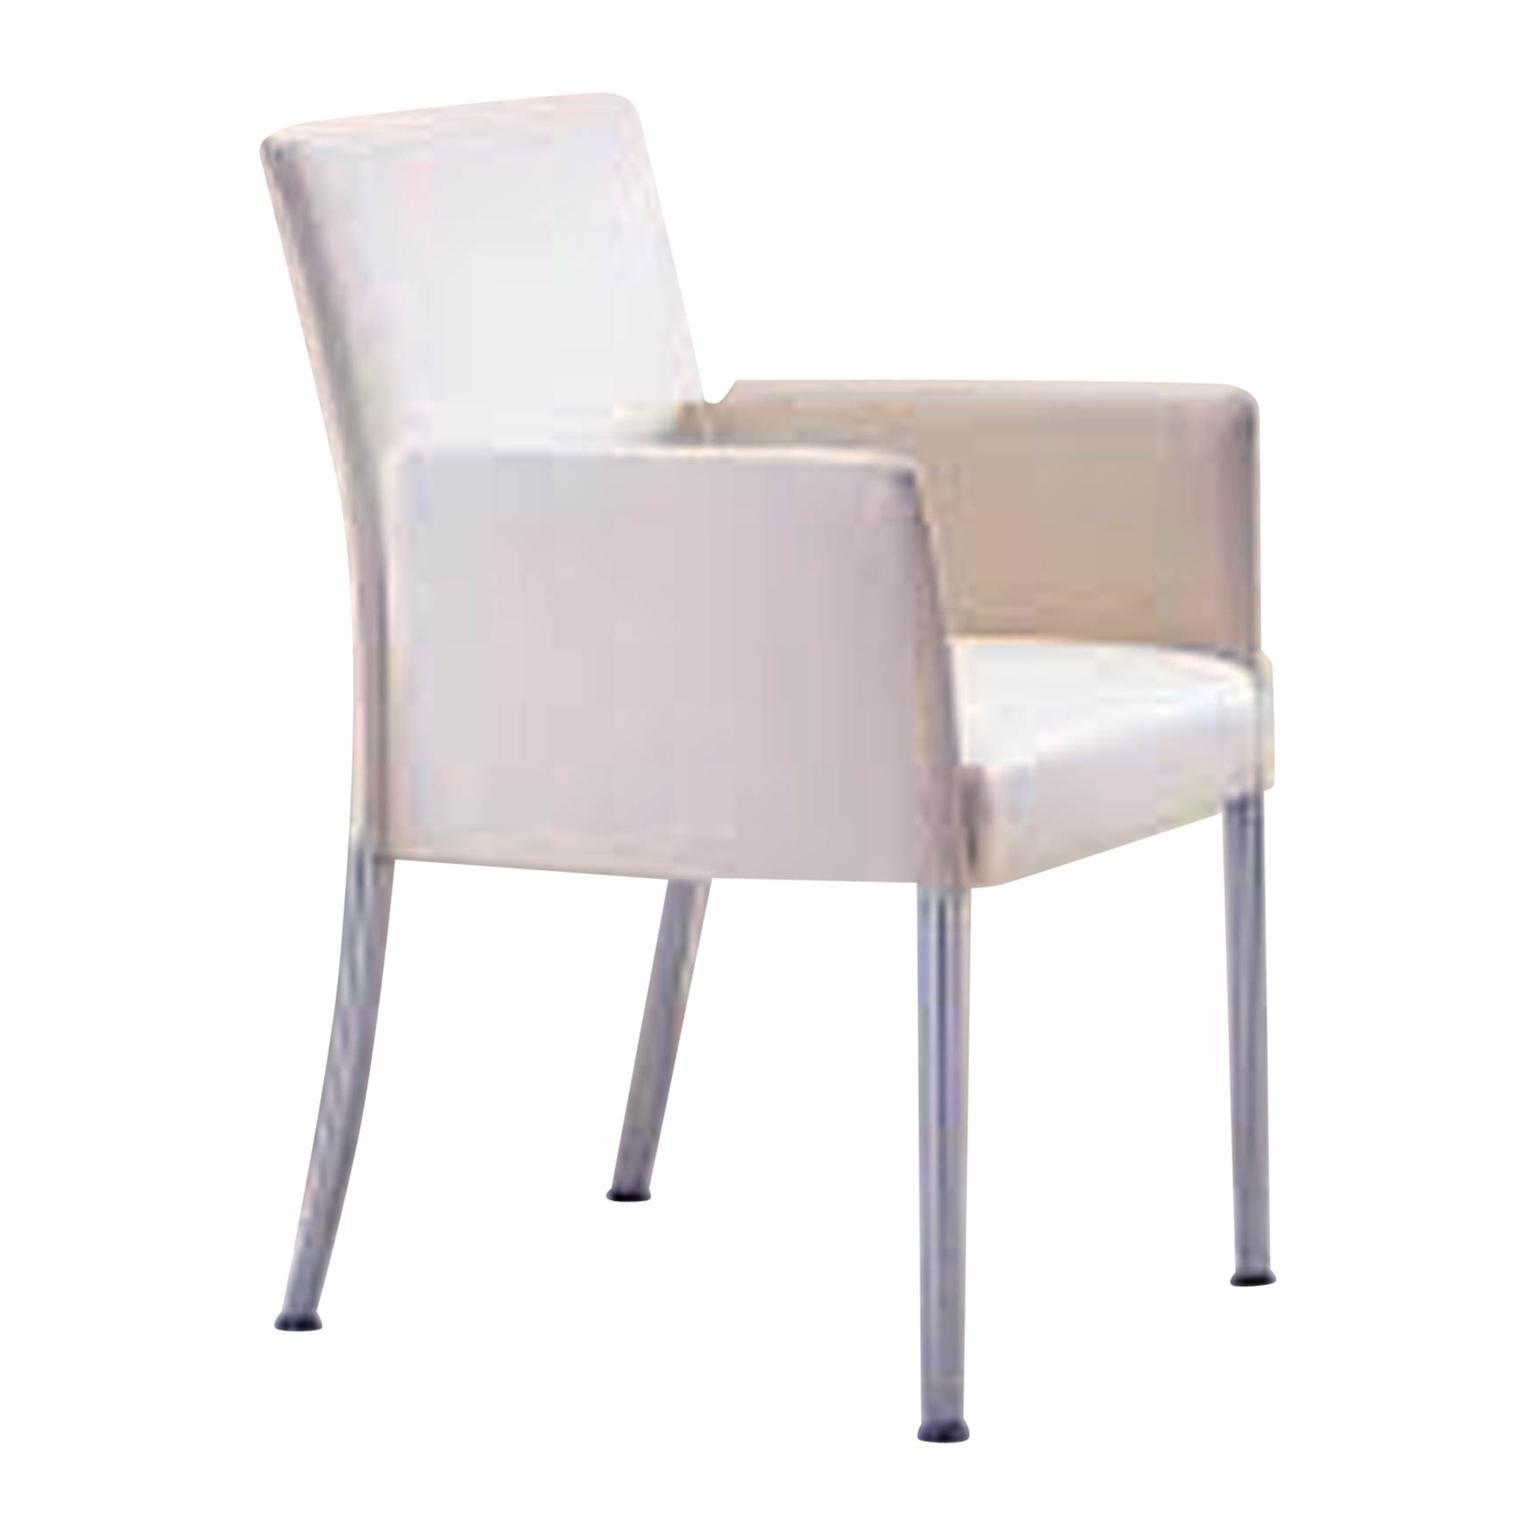 Off White Leather Jason Armchair with Chrome Legs